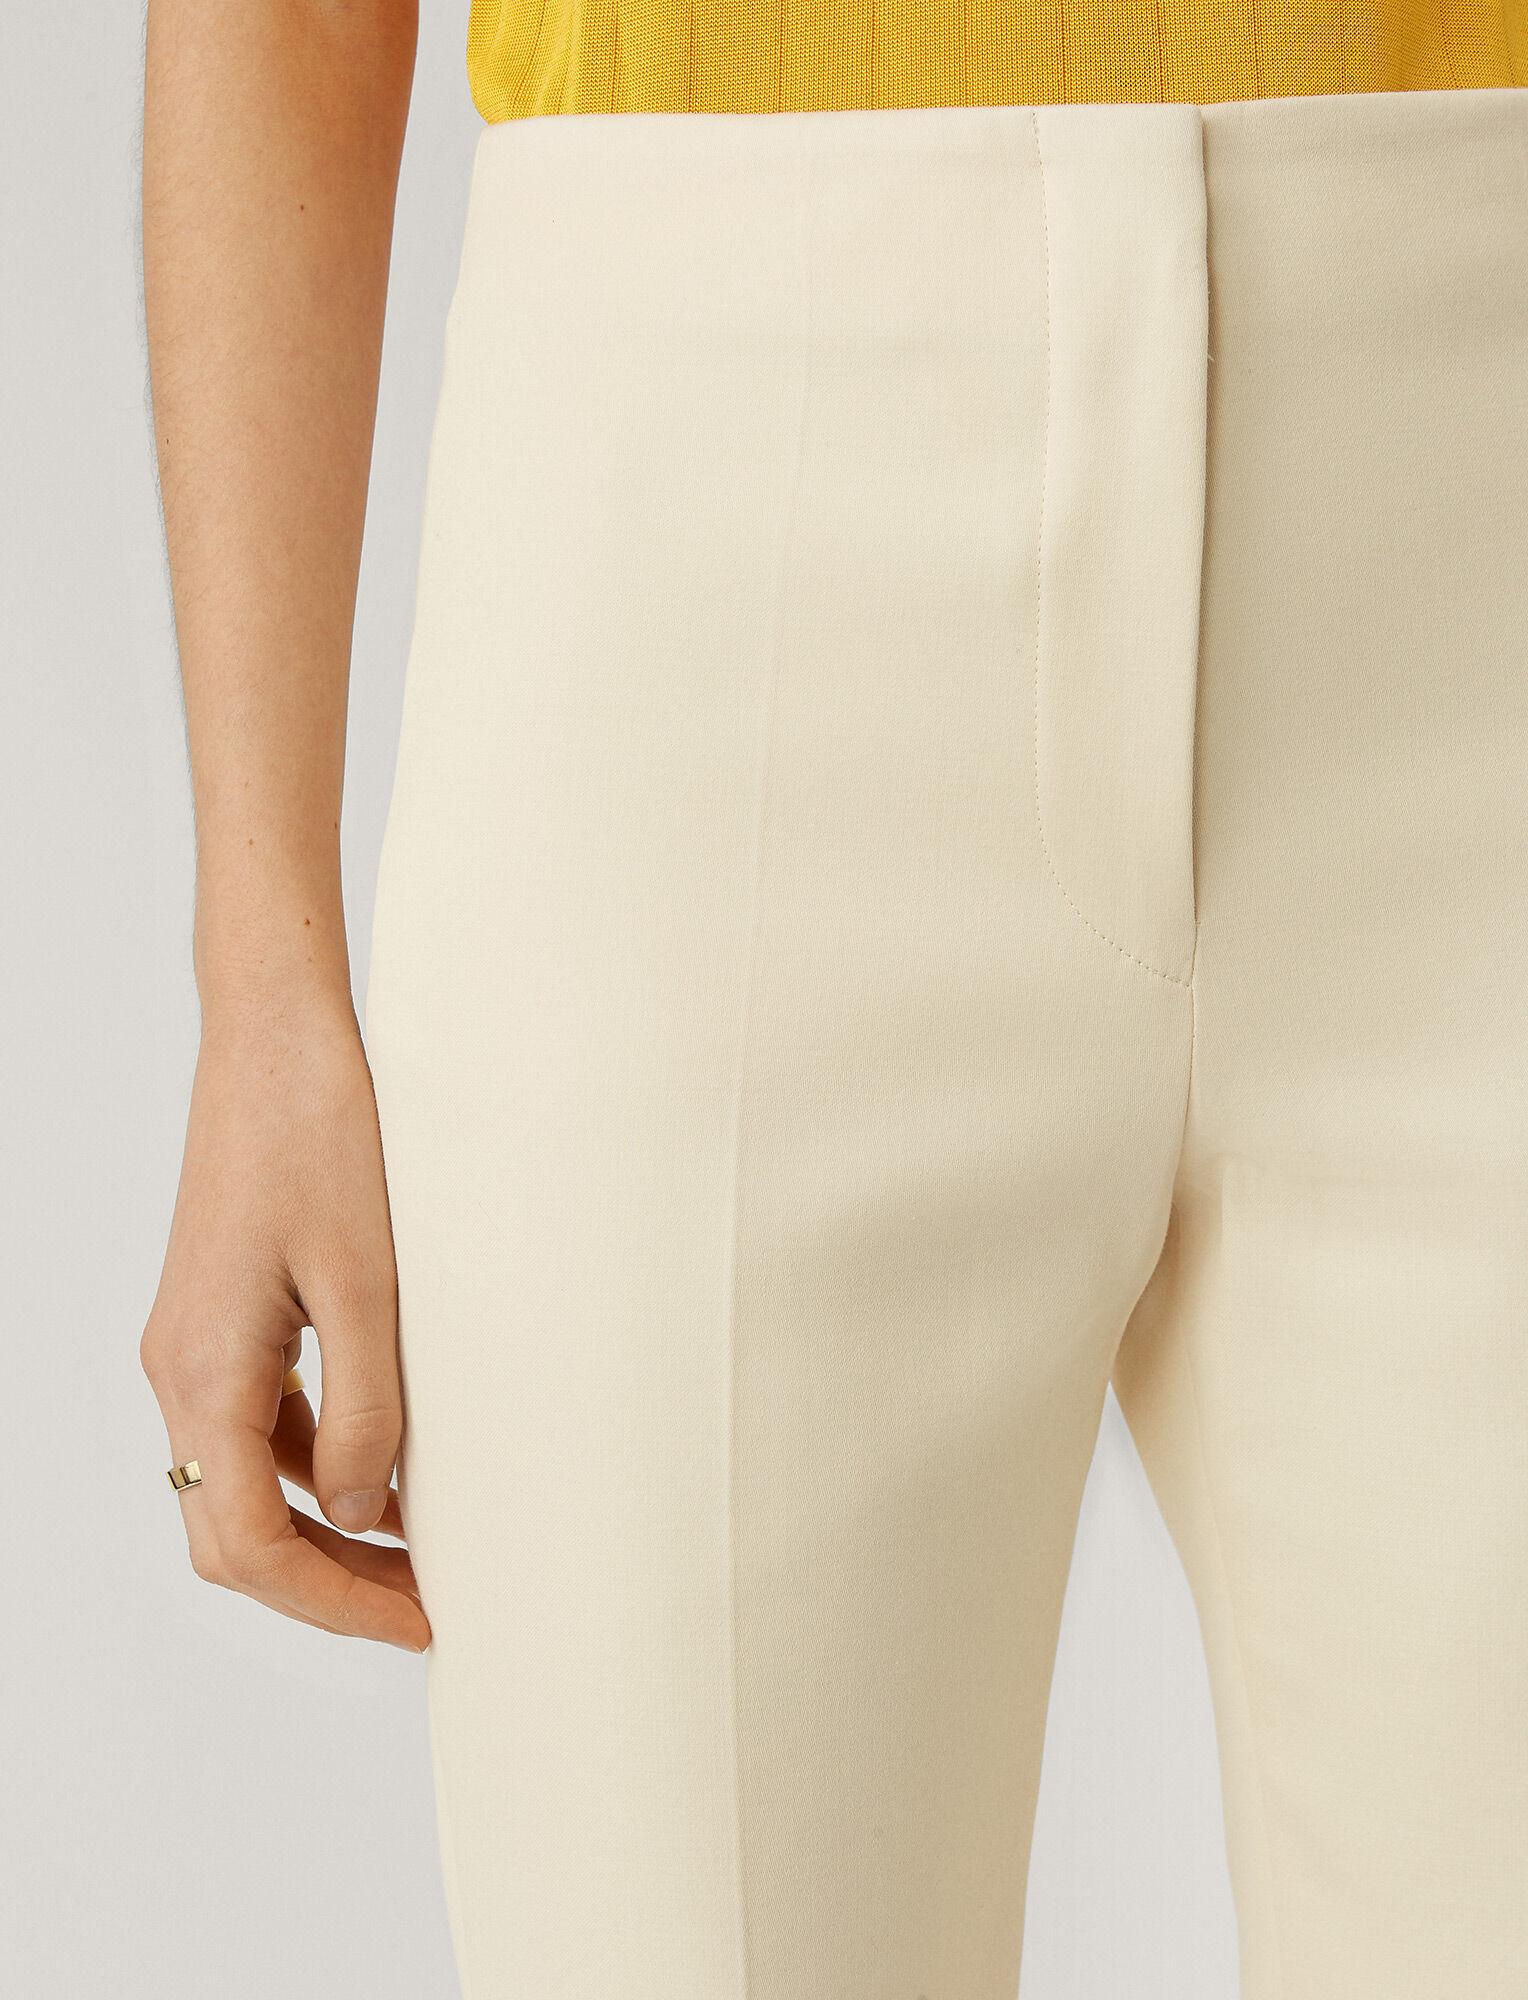 Joseph, Tavi Cotton Sateen Trousers, in CREAM